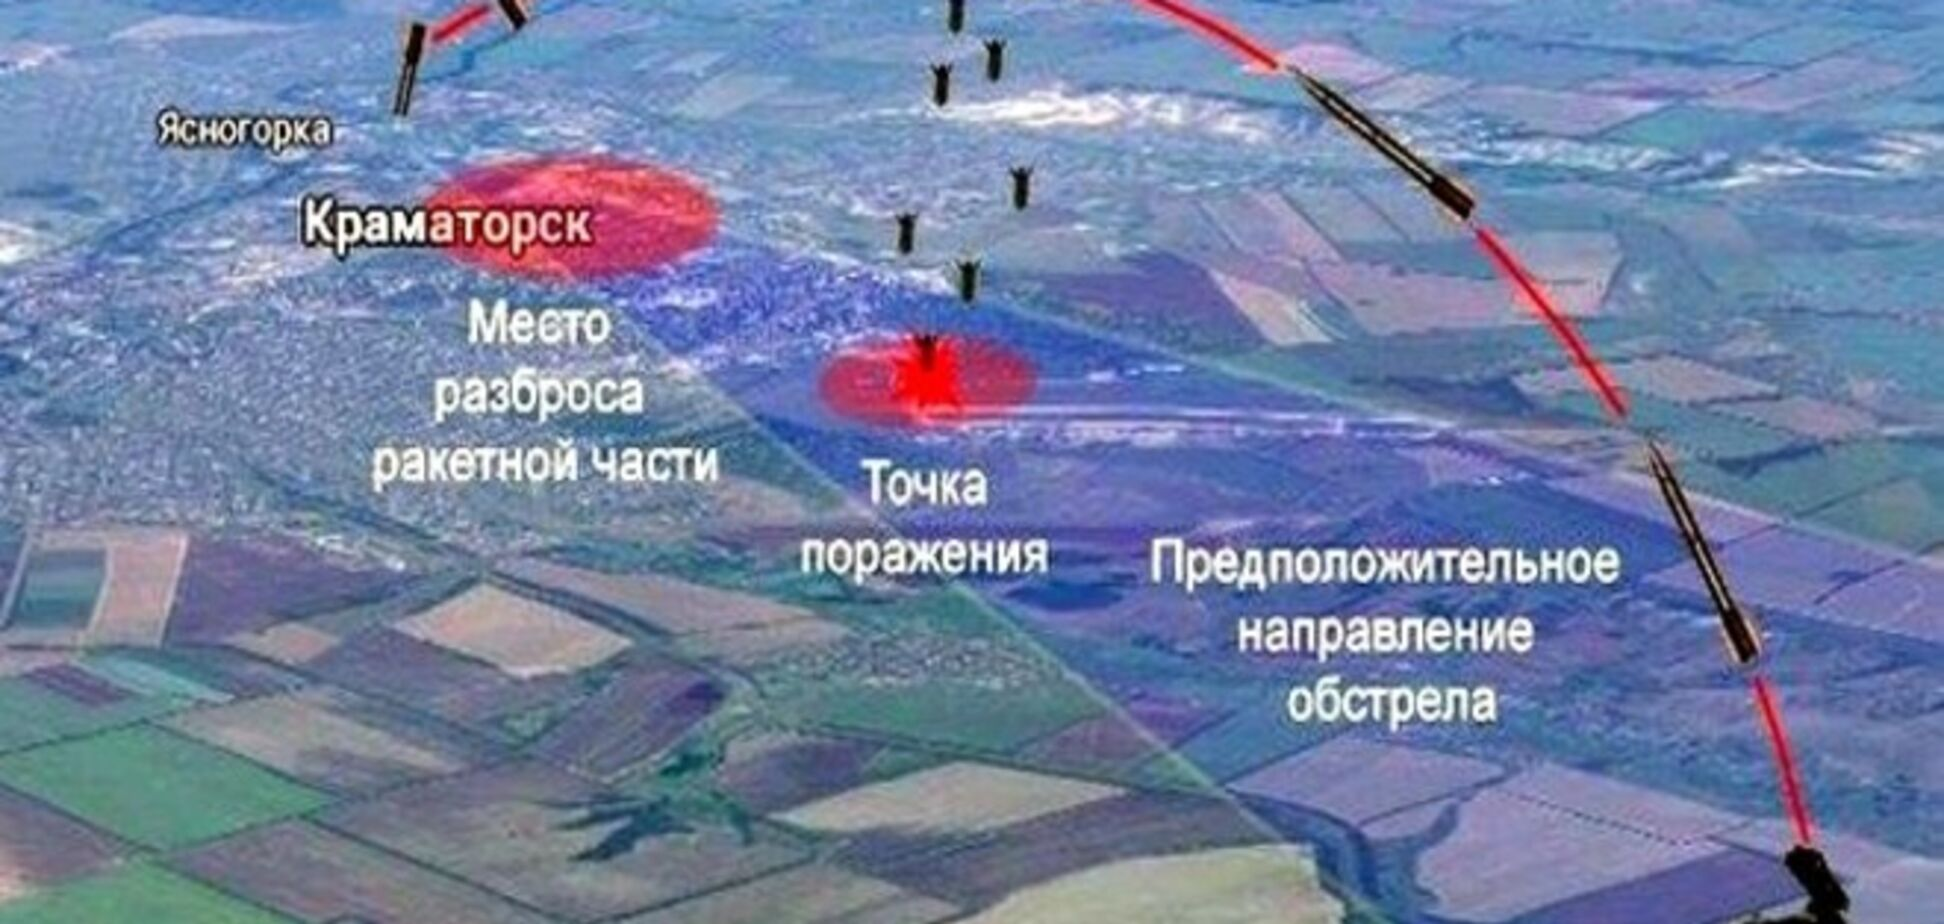 Опубліковано візуалізацію траєкторії польоту і попадання снарядів у Краматорську